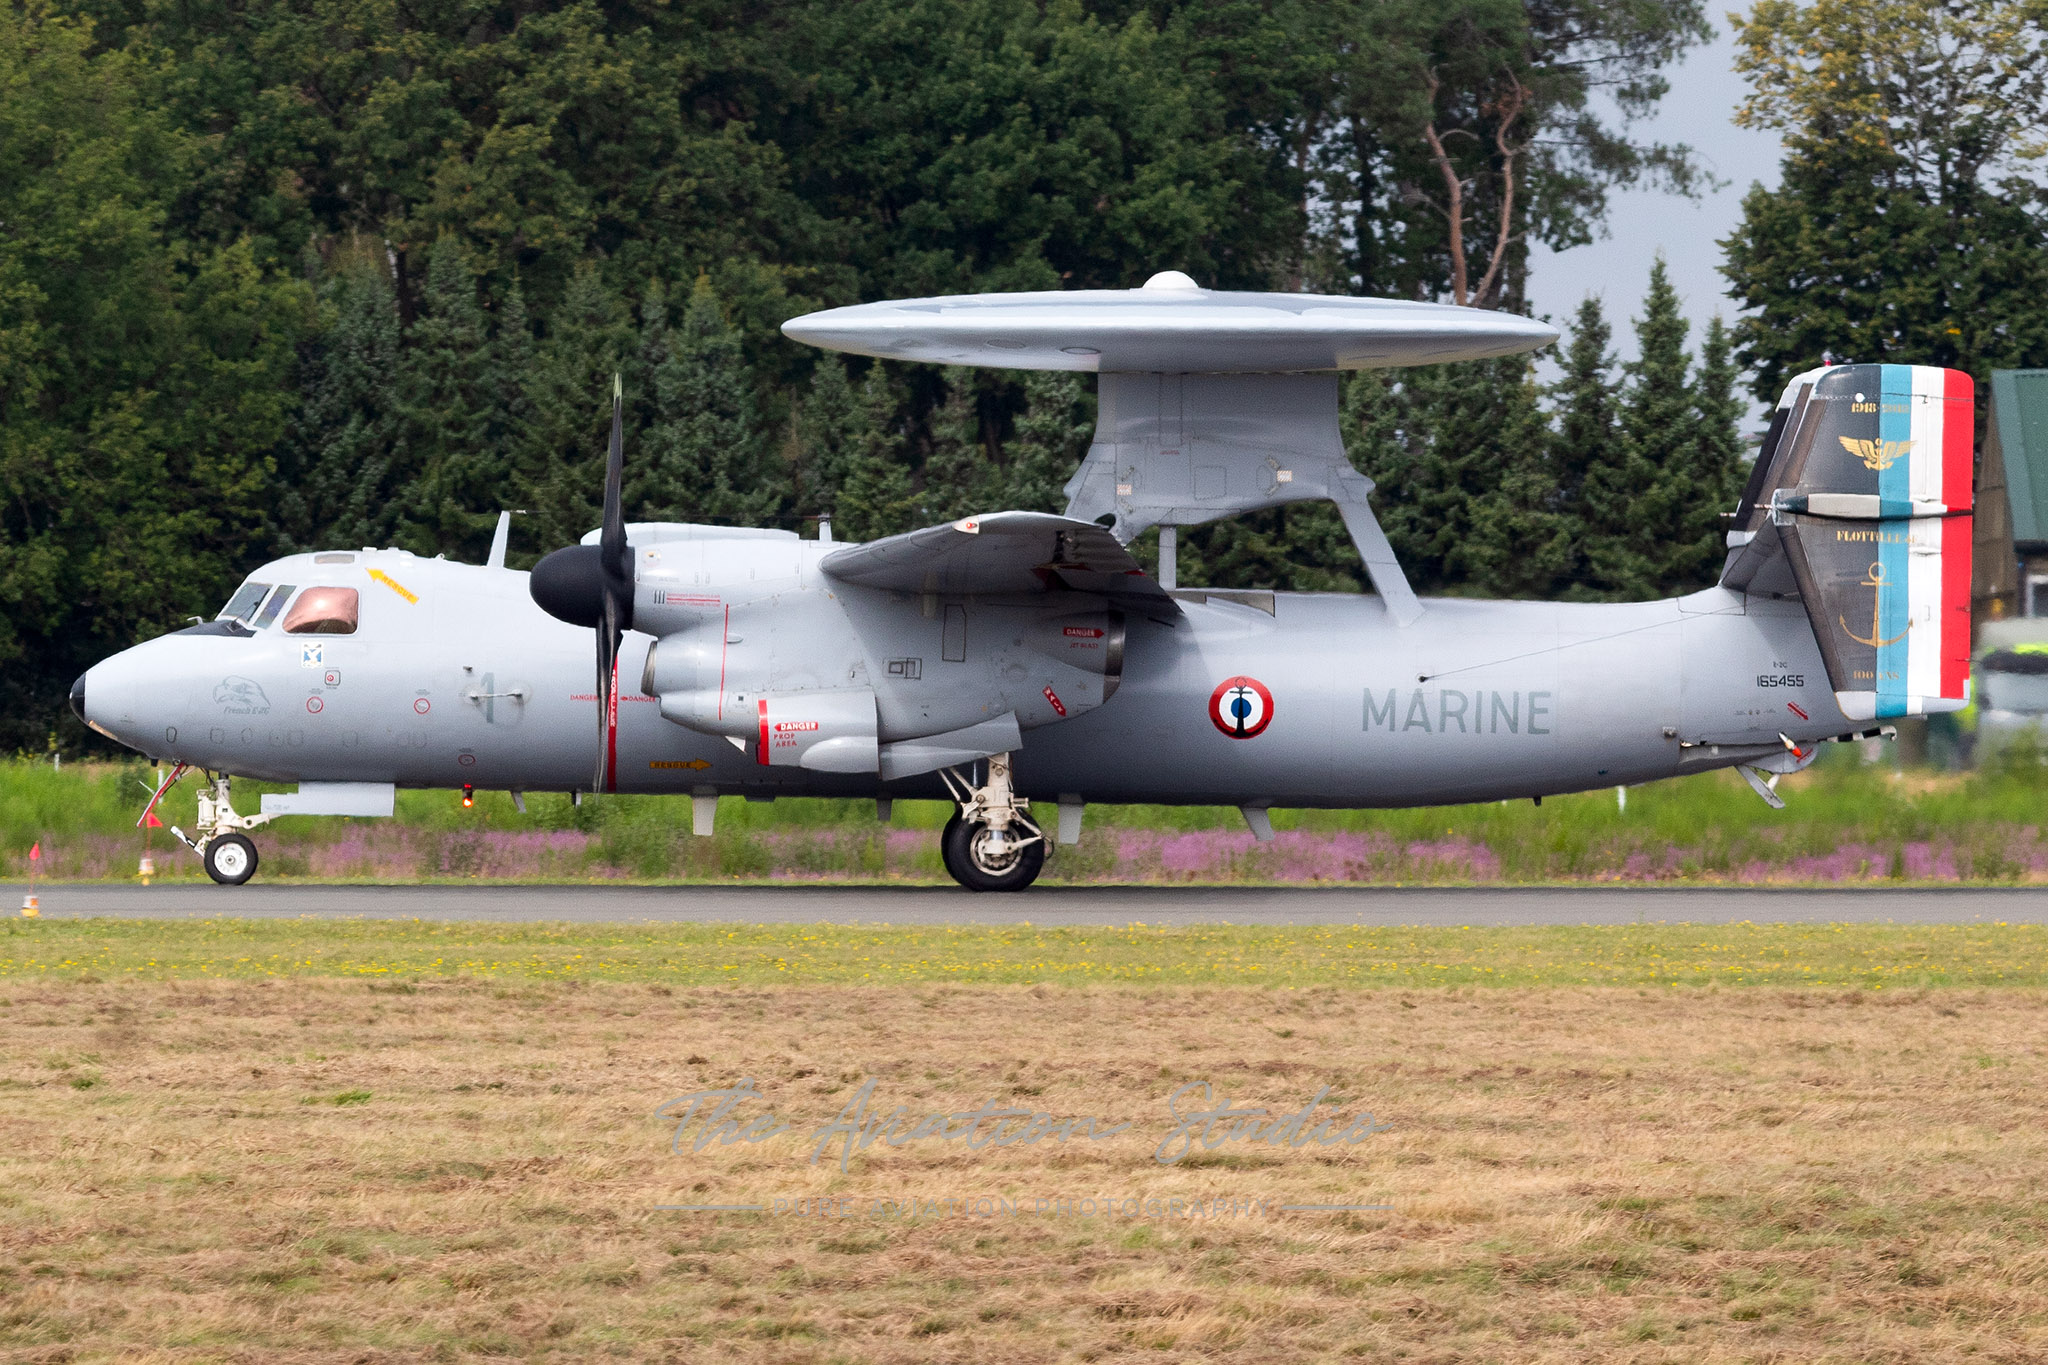 French Navy Grumman E-2C Hawkeye 1 at Spottersday Kleine Brogel 2021